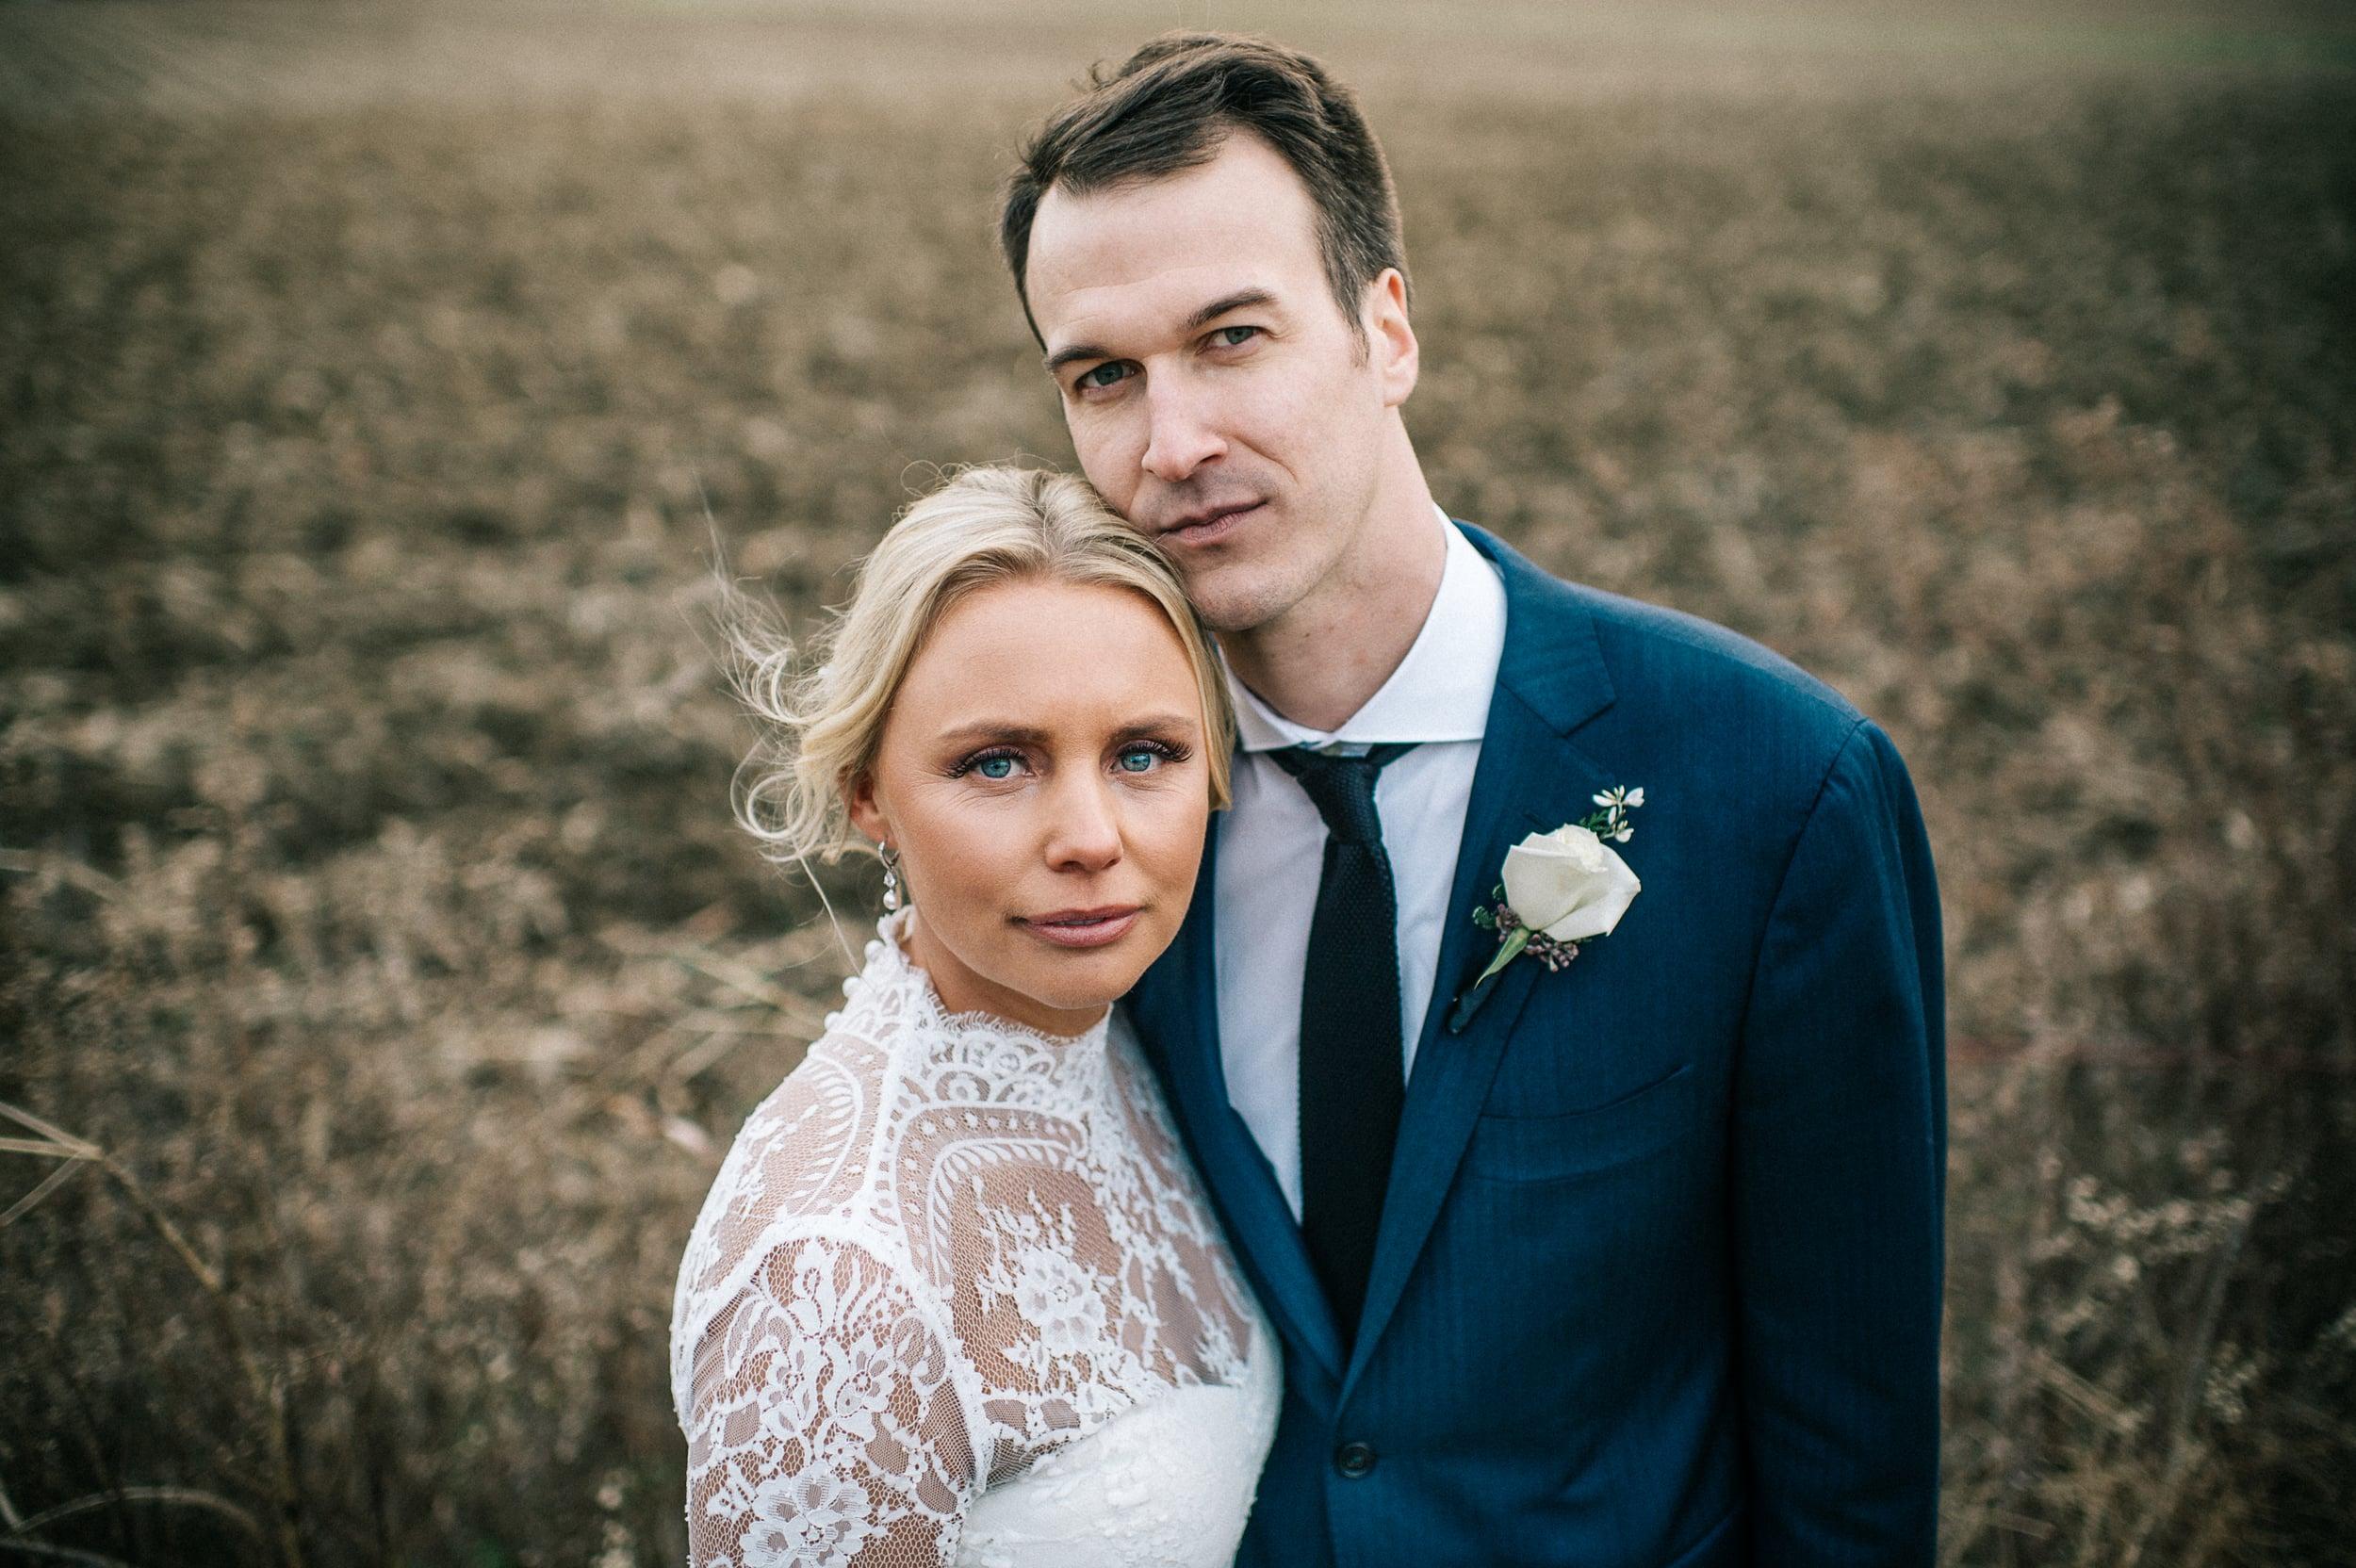 Lehigh-valley-wedding-photographers